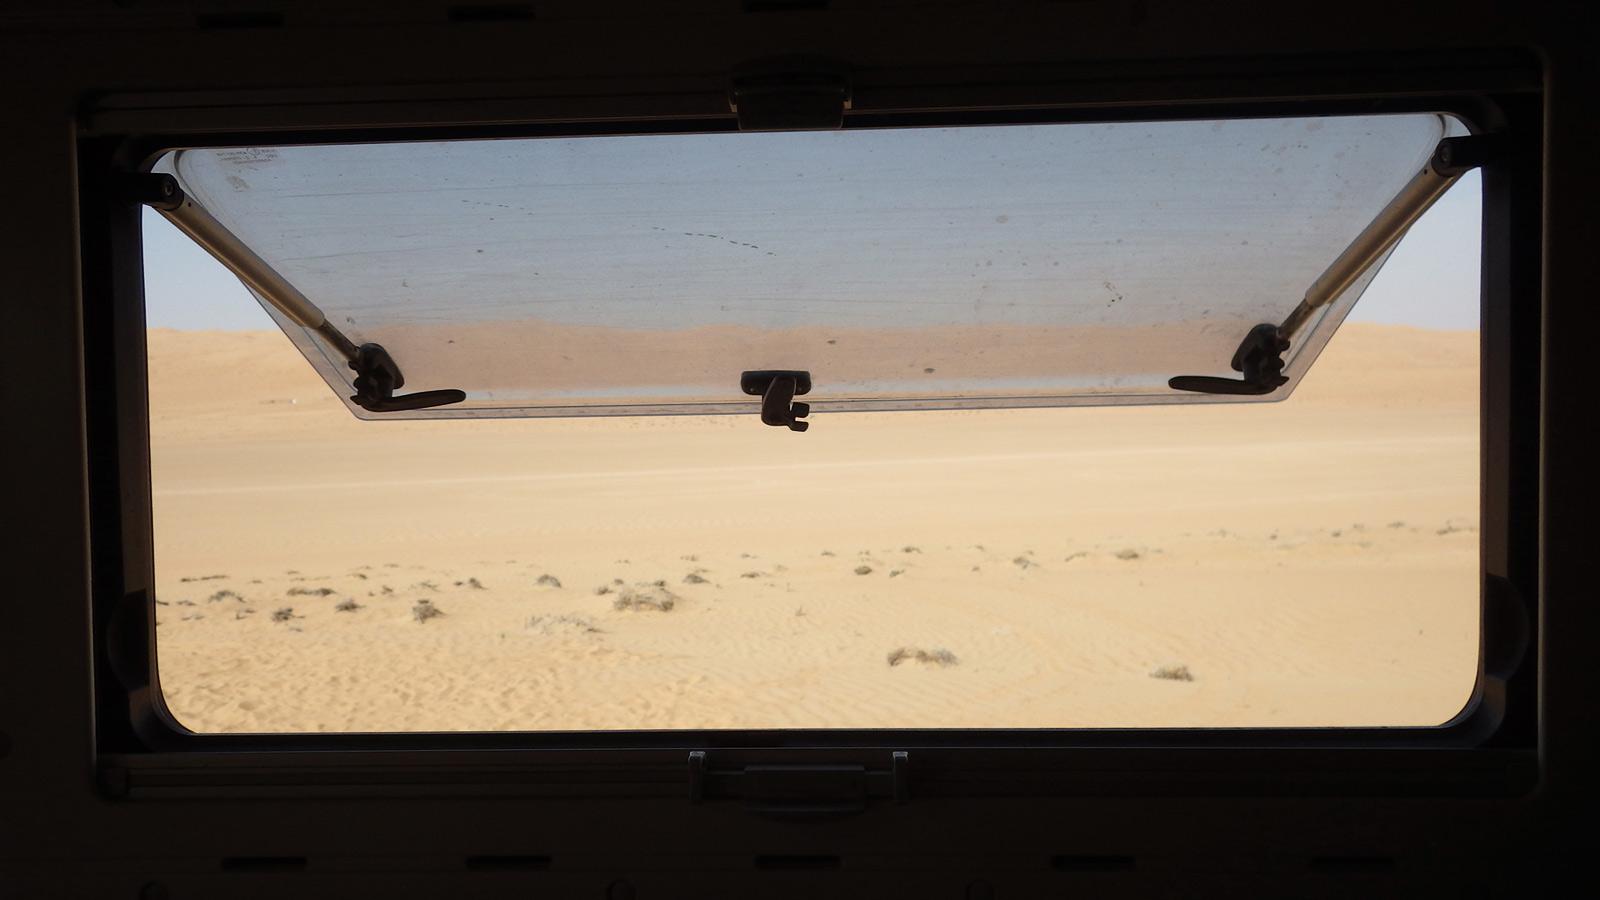 IMGP2883_2016_01_13-Wahiba-Sands-entrée-désert-vers-Al-Bidayah-(Oman)